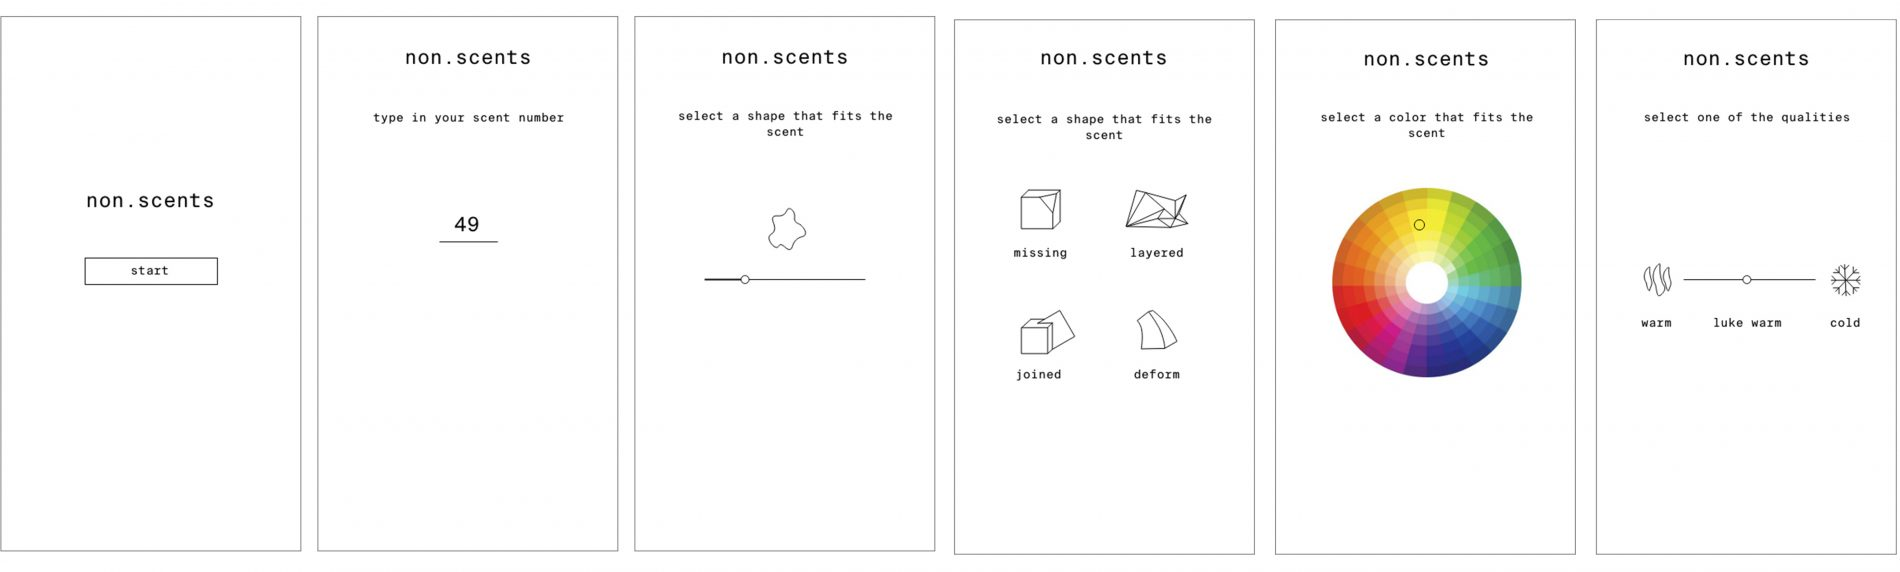 non.scents_tool_app